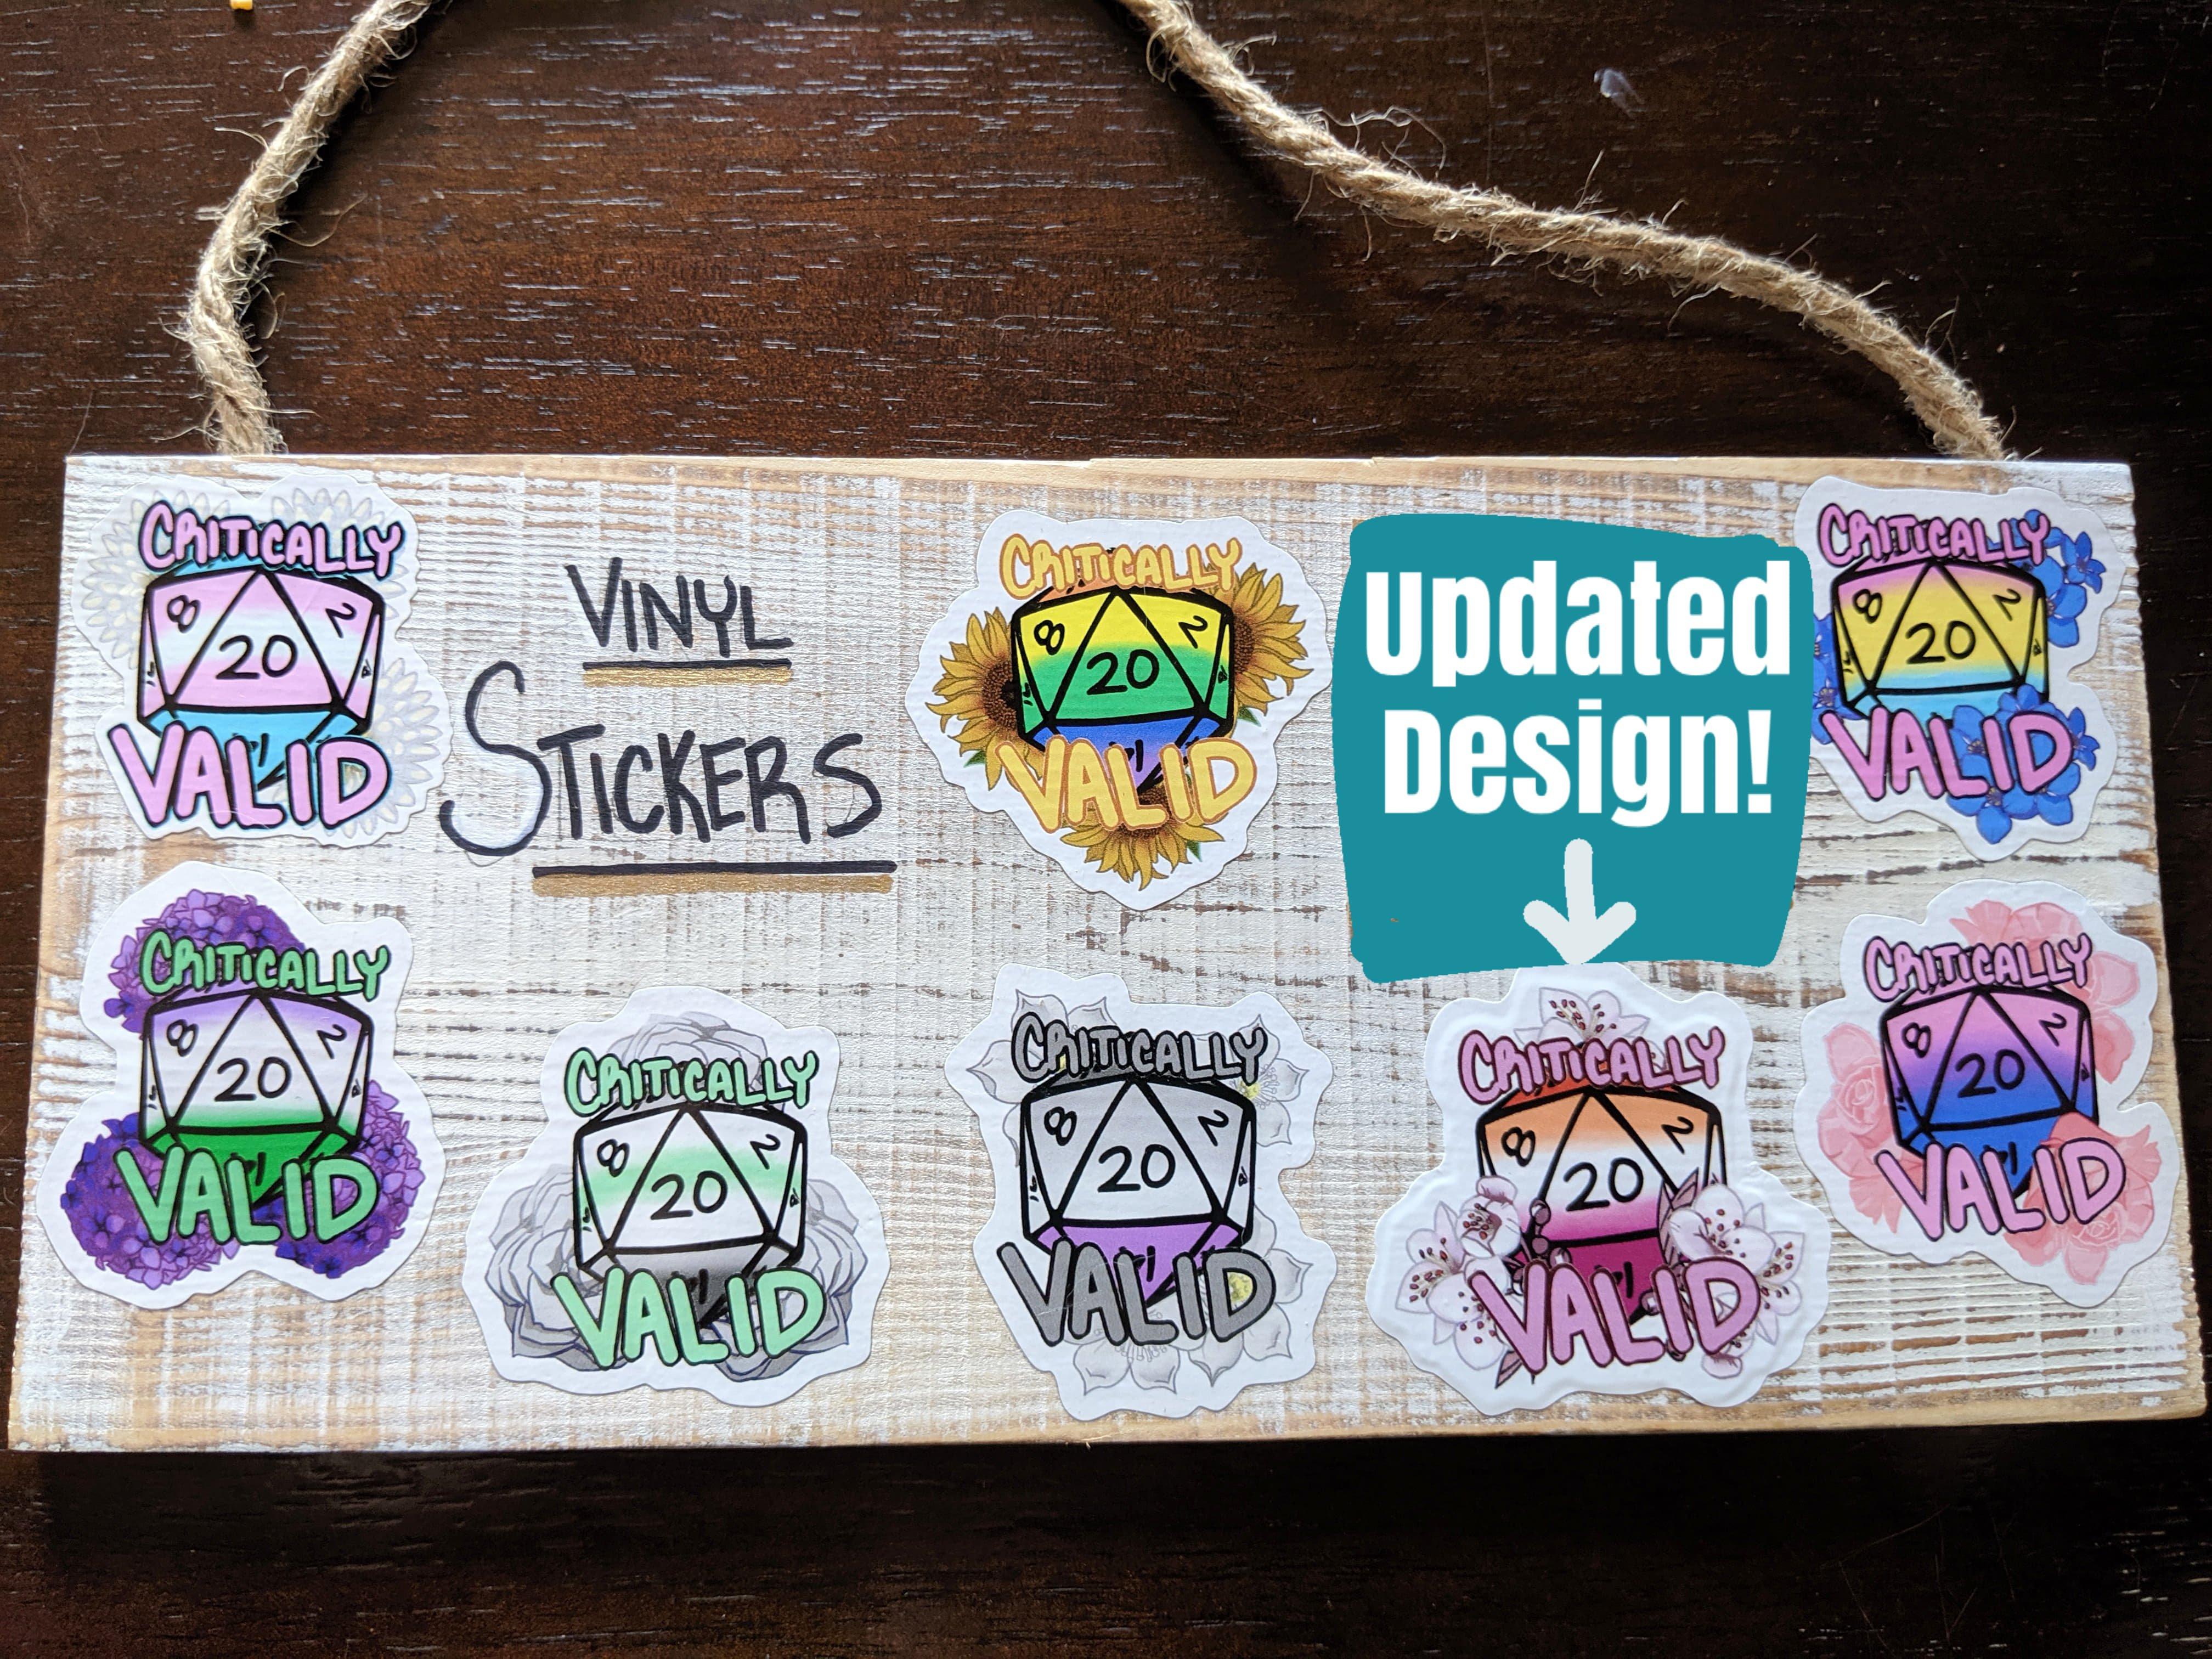 CloudKBD: Critically Valid vinyl stickers